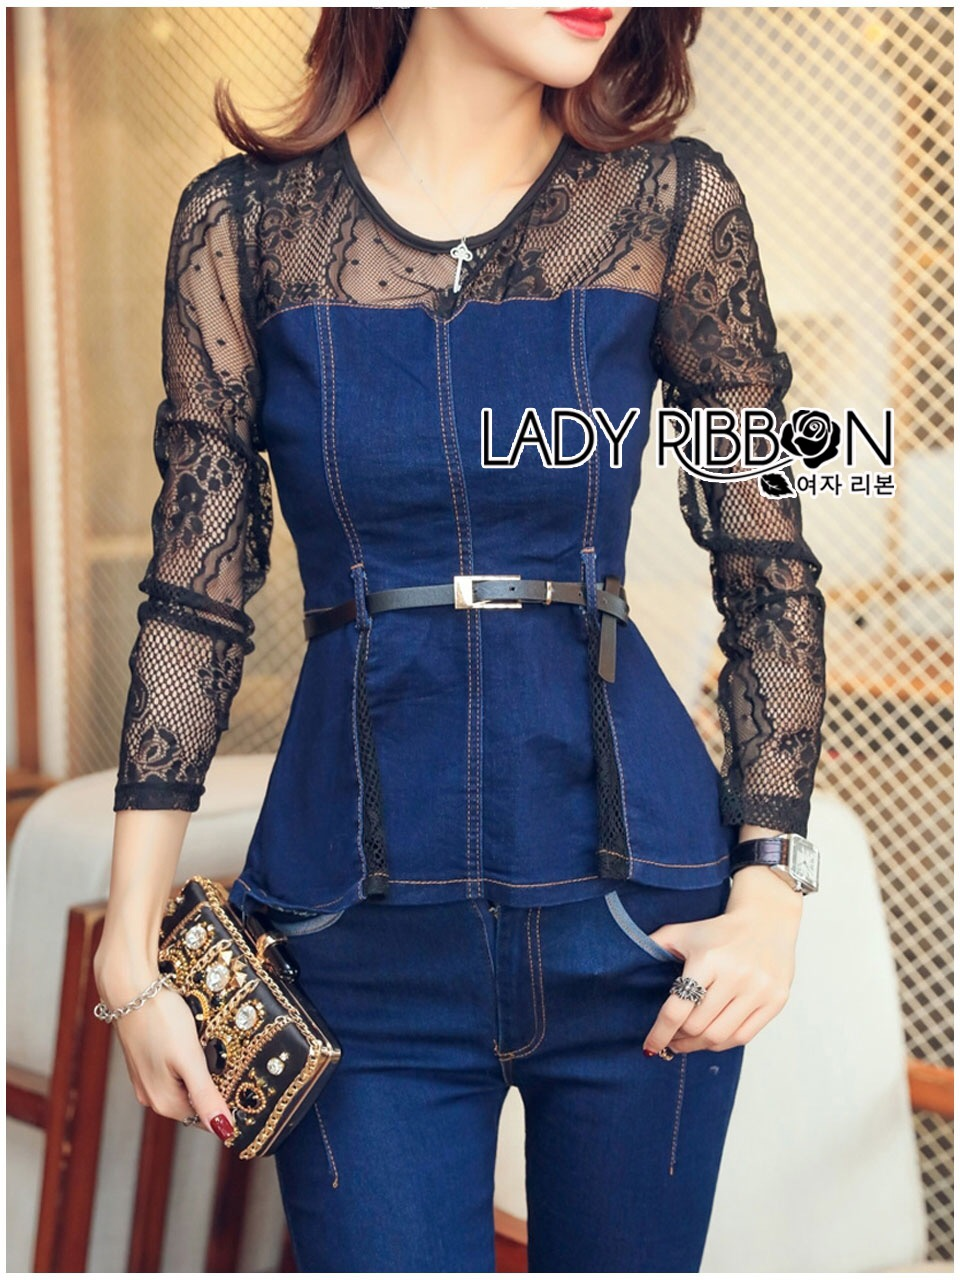 Lady Ribbon Korea Dress LR03060616 &#x1F380 Lady Ribbon's Made &#x1F380 Lady Kimberley Smart and Sexy Black Lace with Denim Set เ